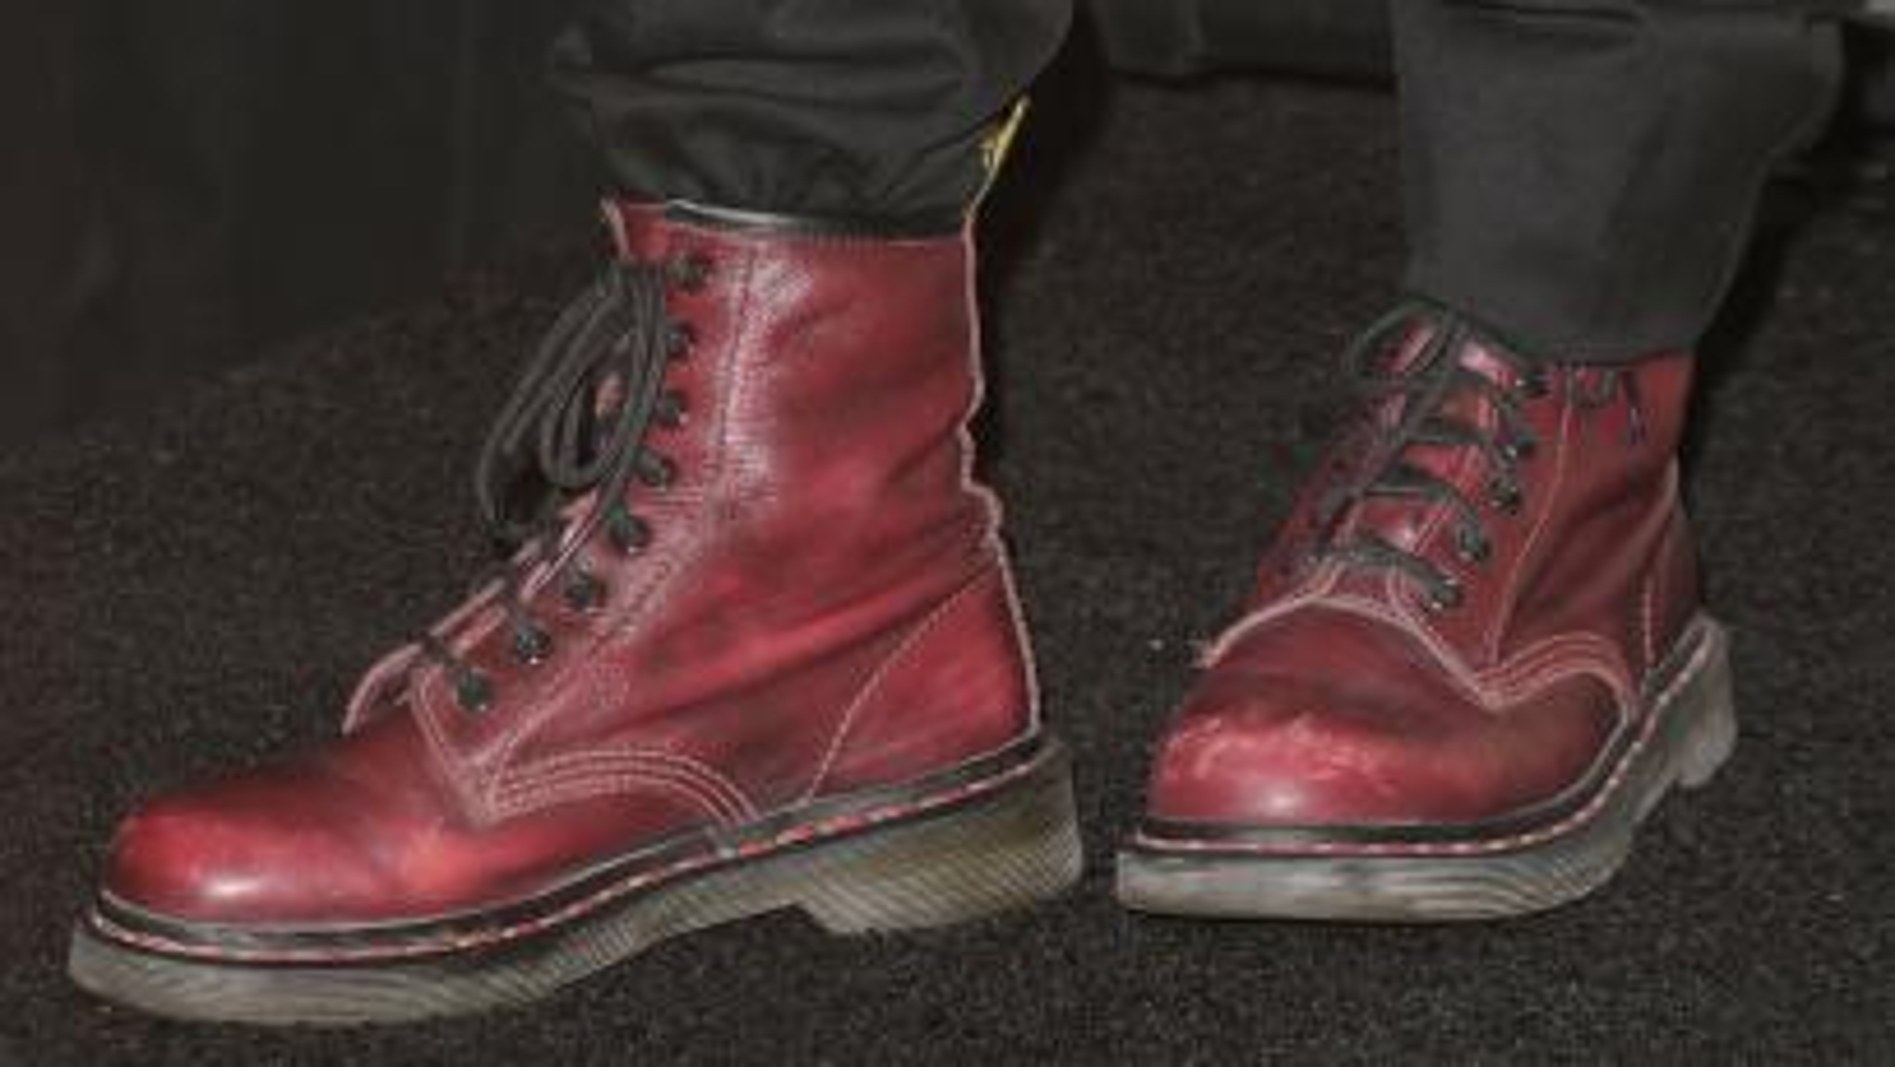 Doc Martens / Dr. Martens boots